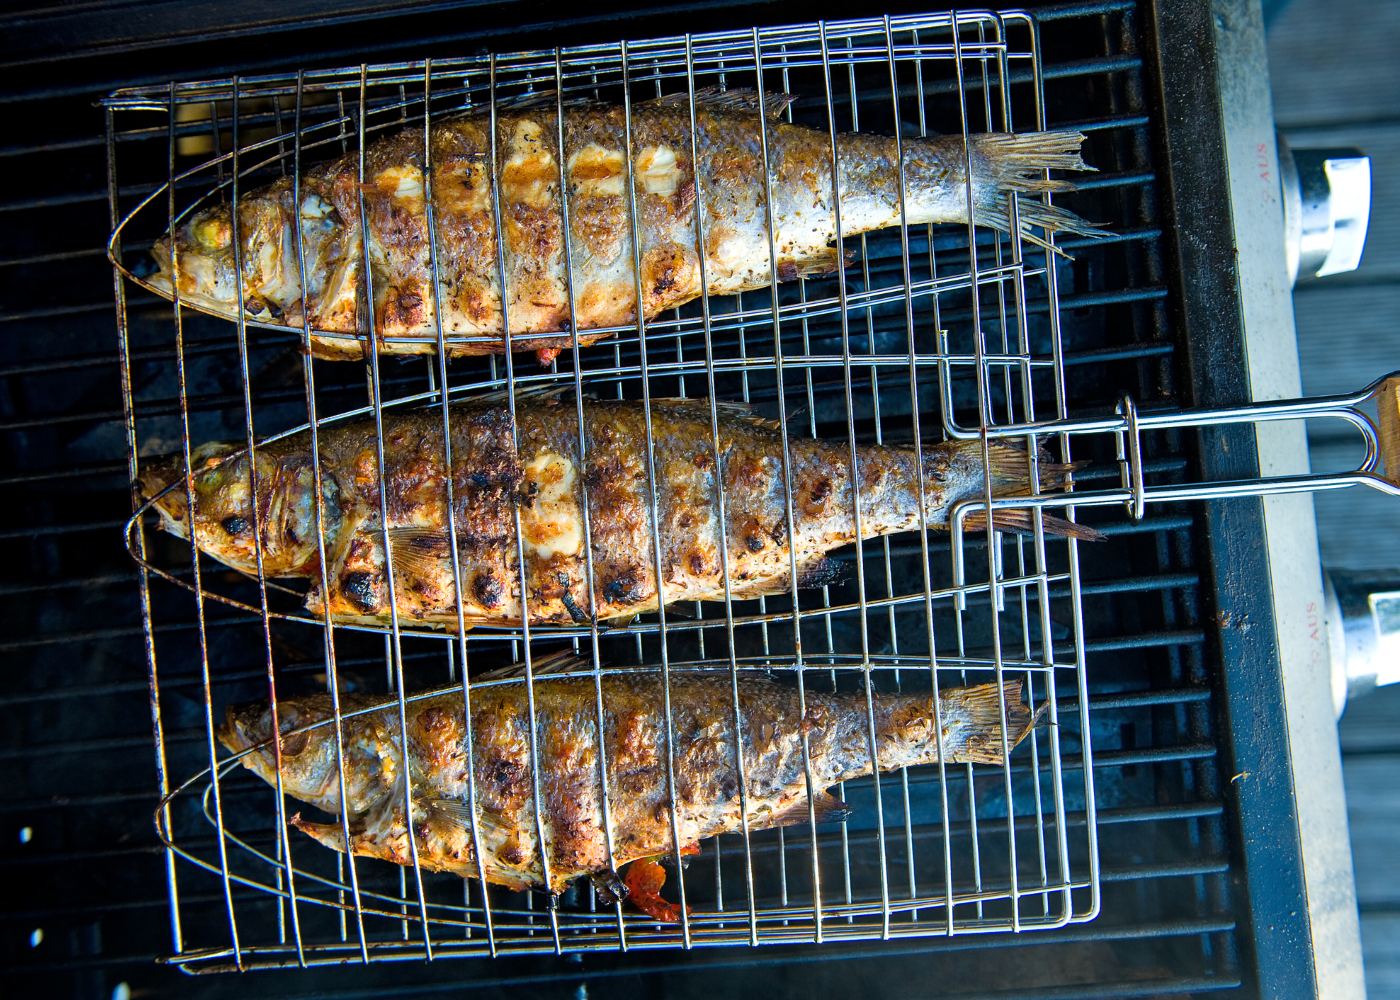 peixe na grelha para assar nas brasas